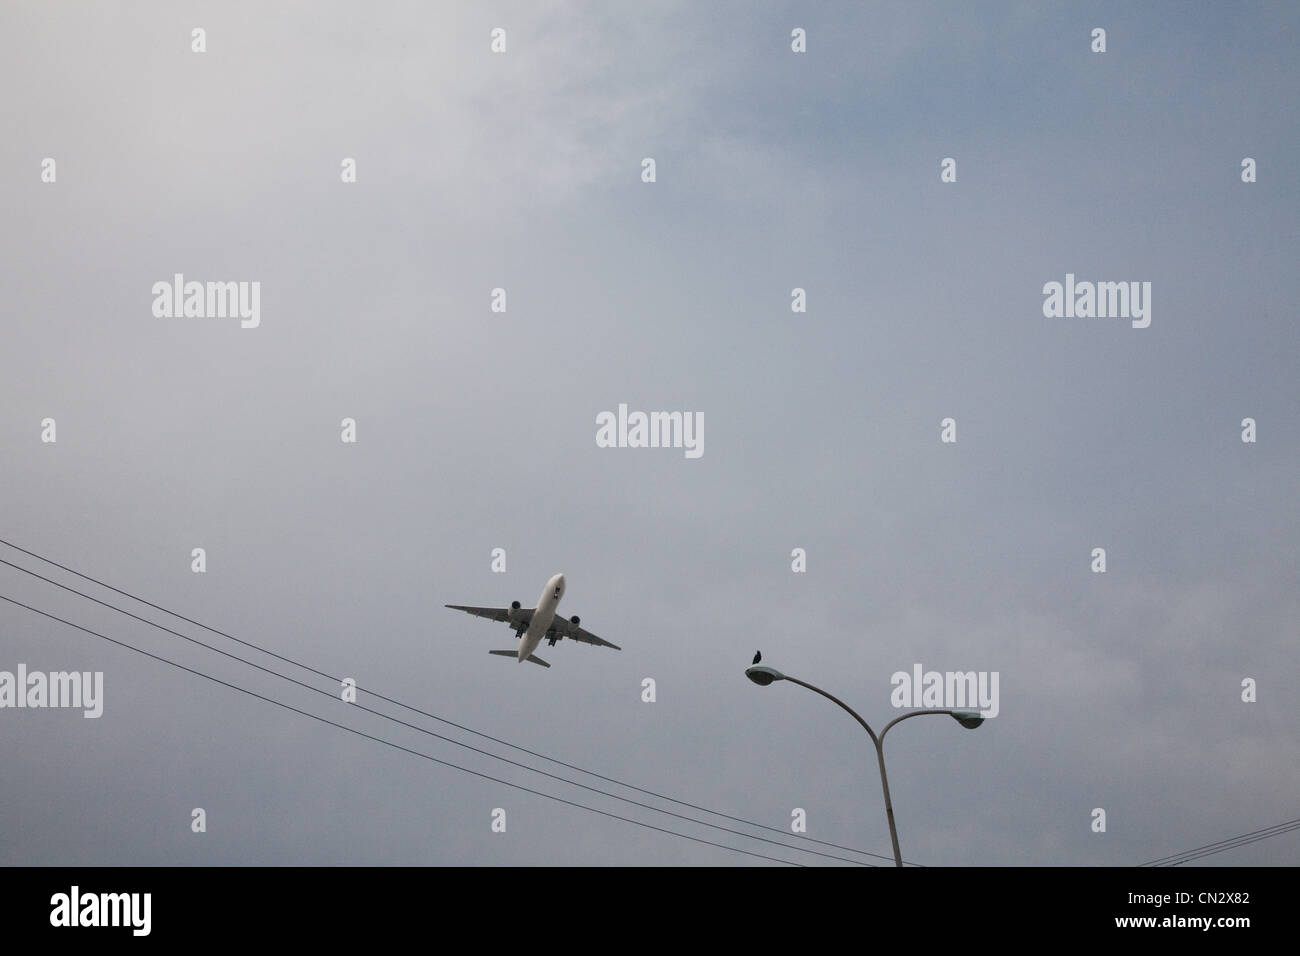 Flugzeug, niedrigen Winkel Ansicht Stockbild